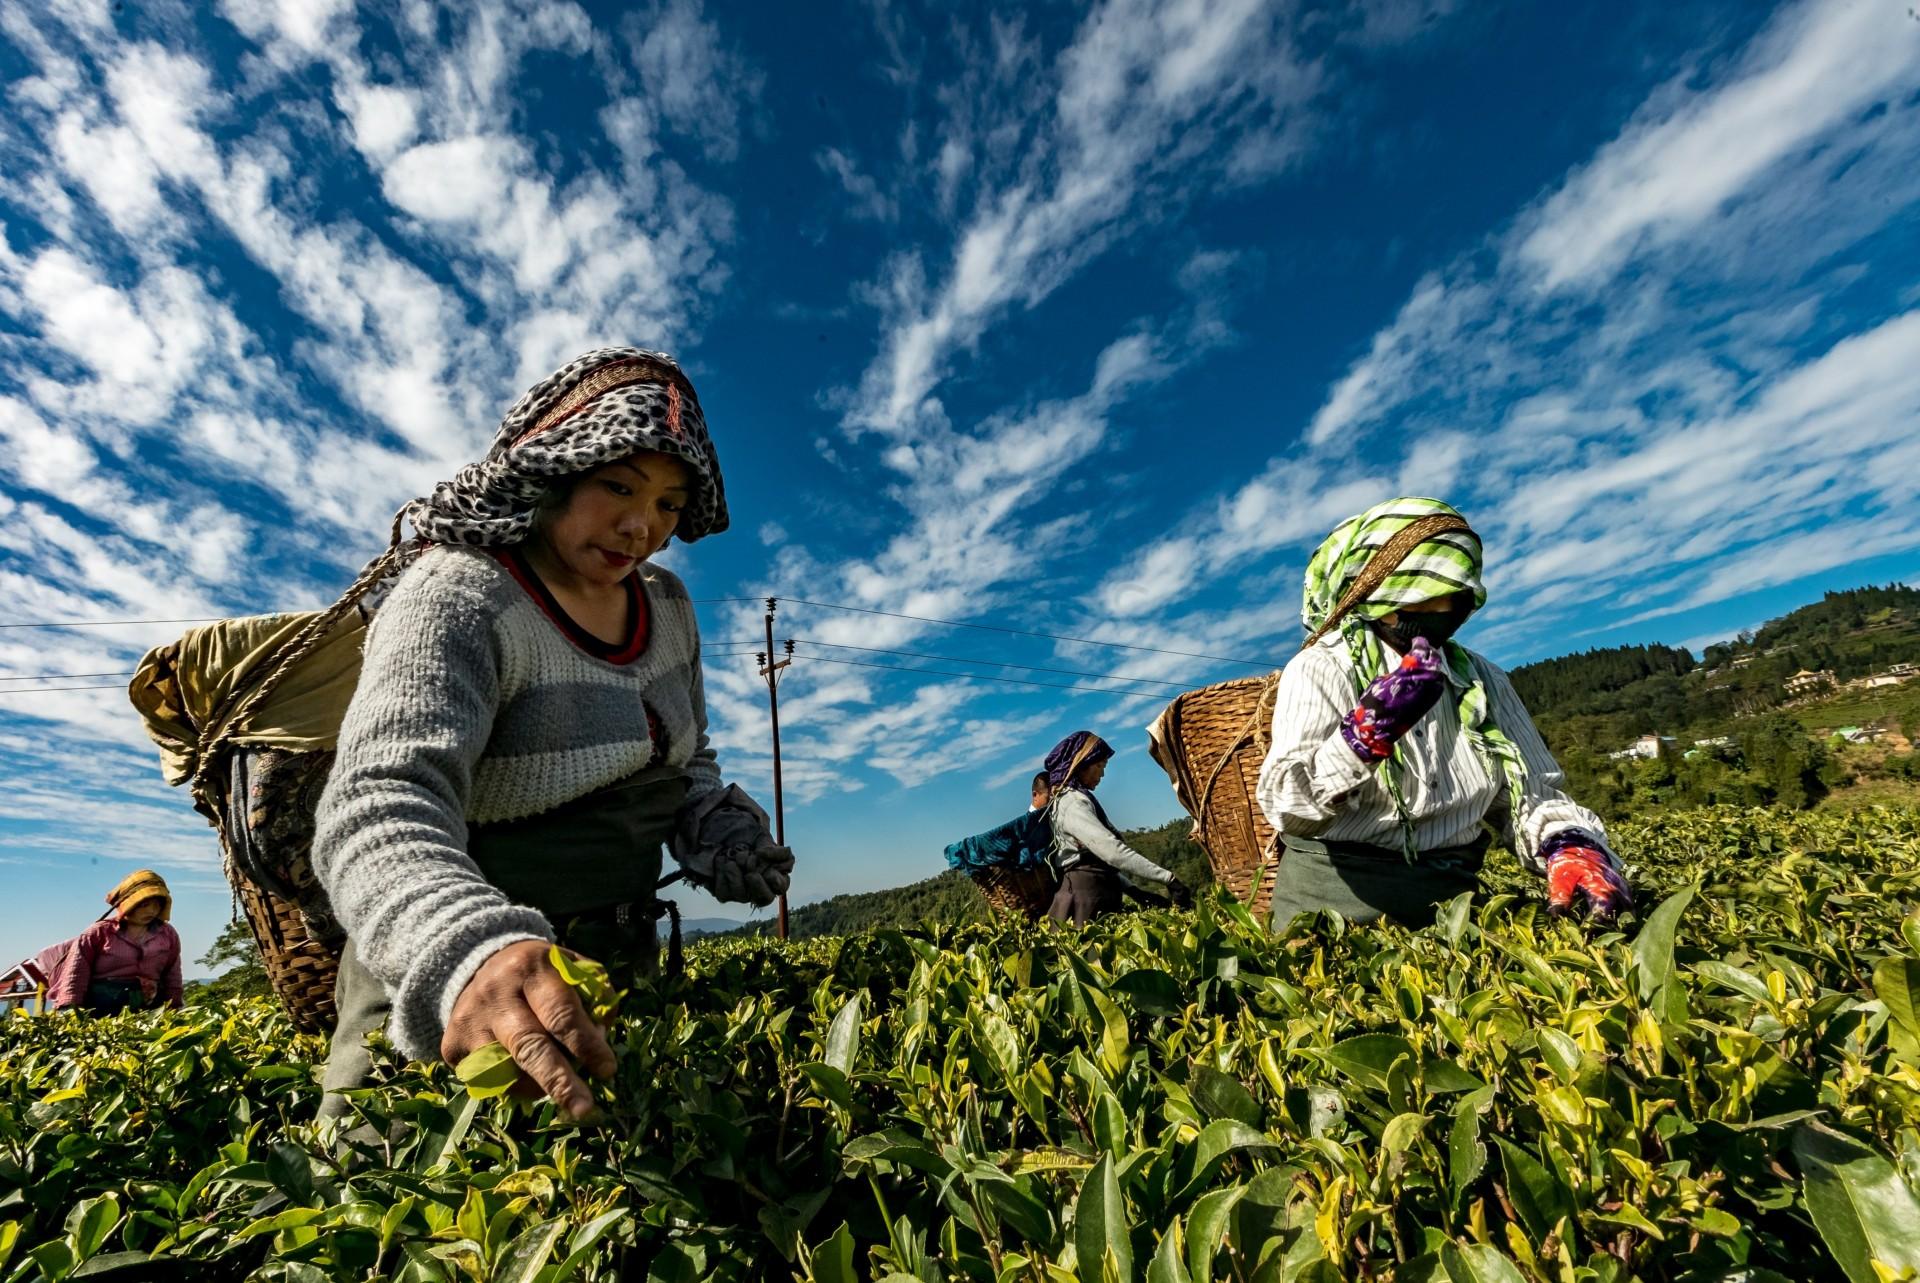 Norge må øke støtten til FNs Grønne Klimafond og FNs Tilpasningsfond